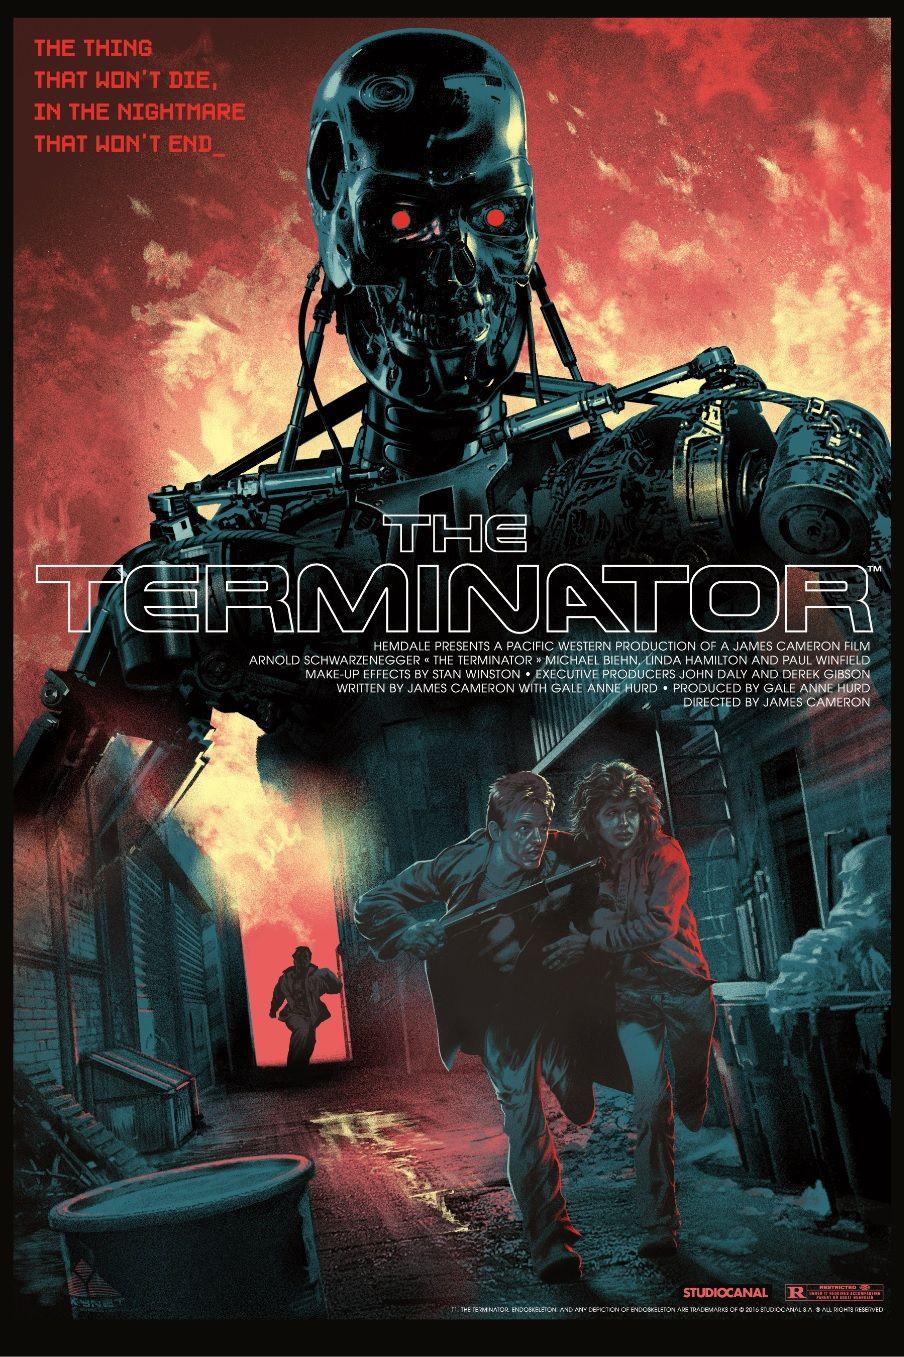 Terminator 2 Film Complet En Francais 1984 : terminator, complet, francais, Manof2moro, Affiche, Film,, Artistique